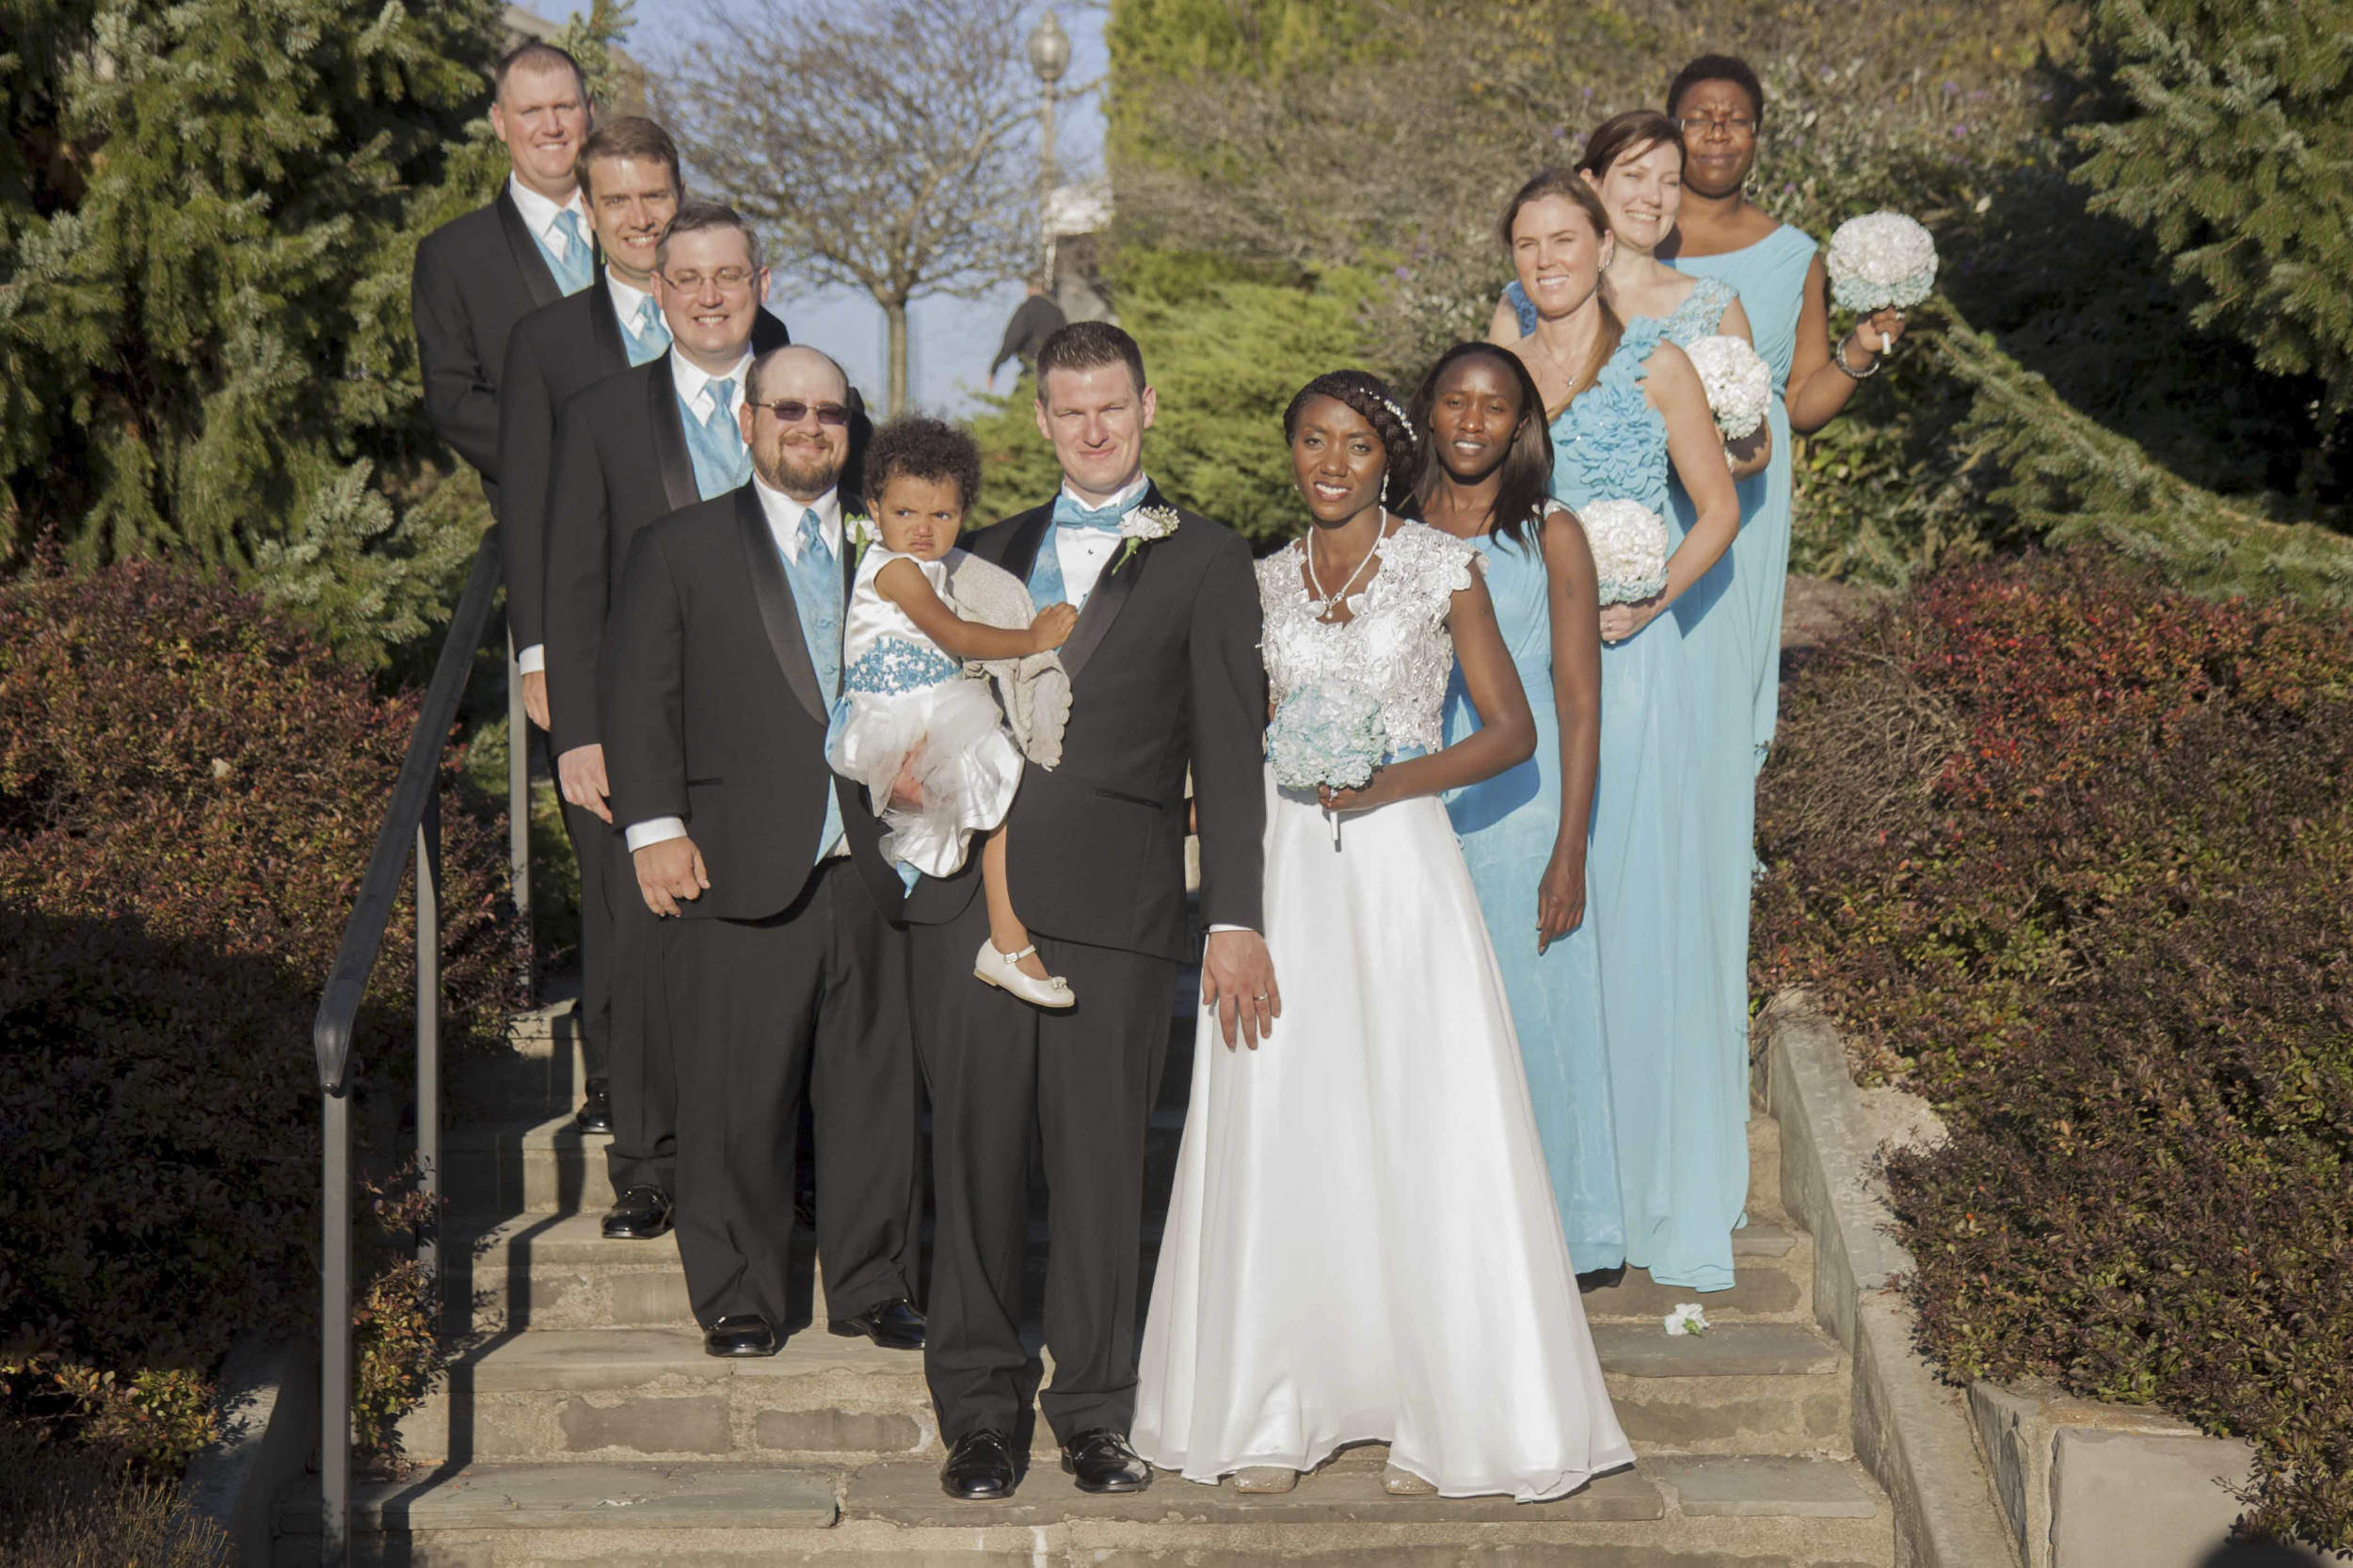 Beiersdorfer Wedding - 46.jpg